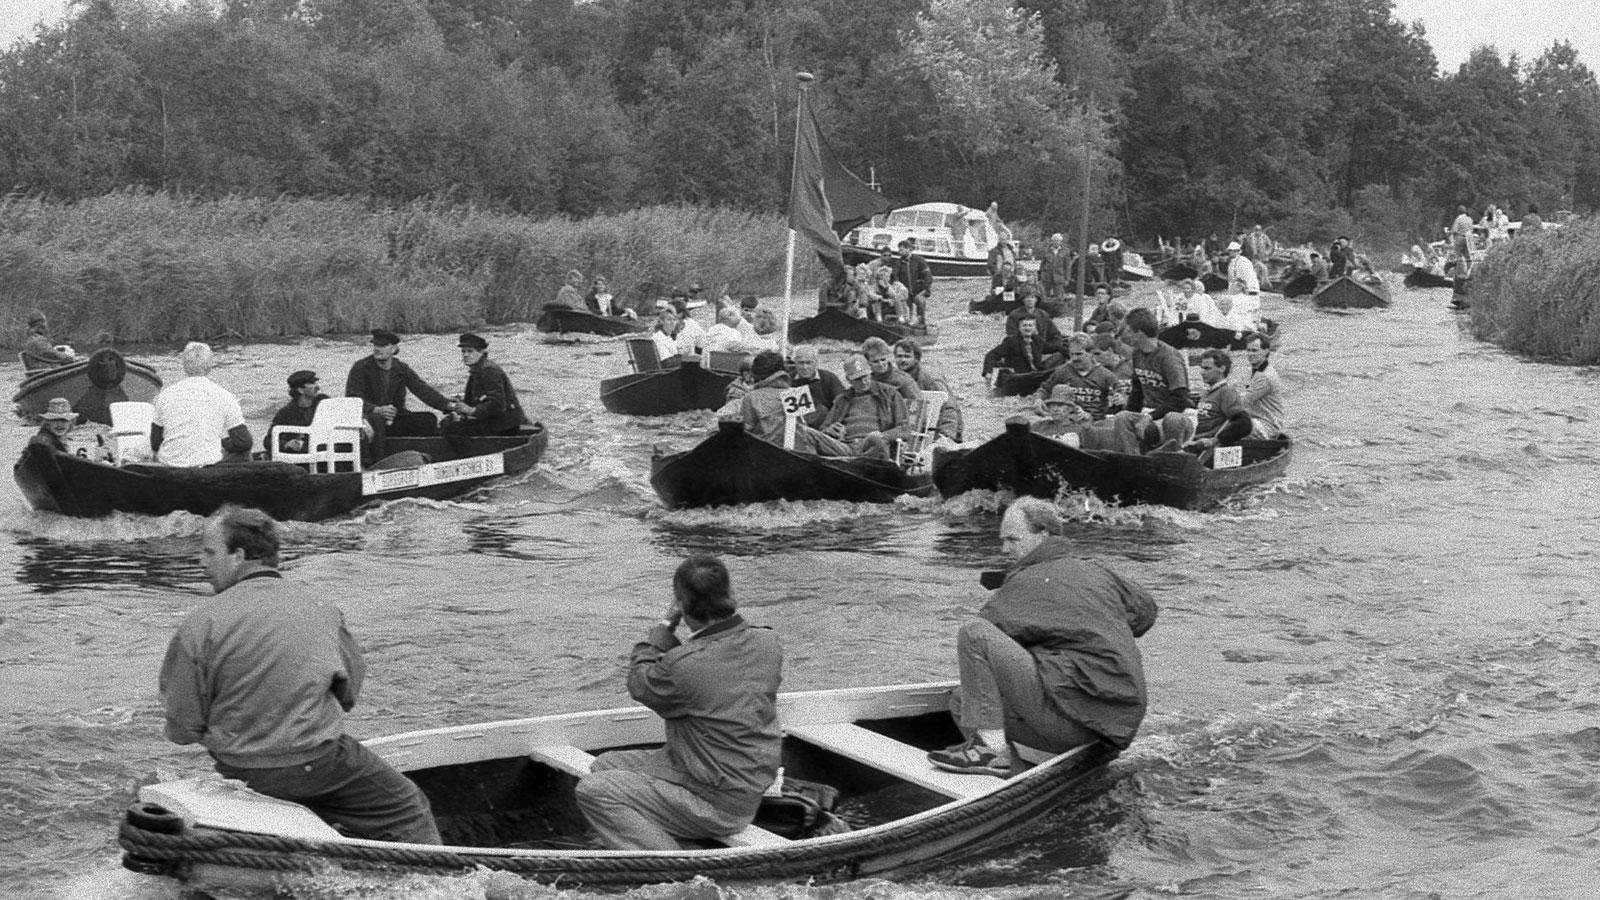 Film - video van de Pramenrace van 1988 - Oud Aalsmeer in Beeld